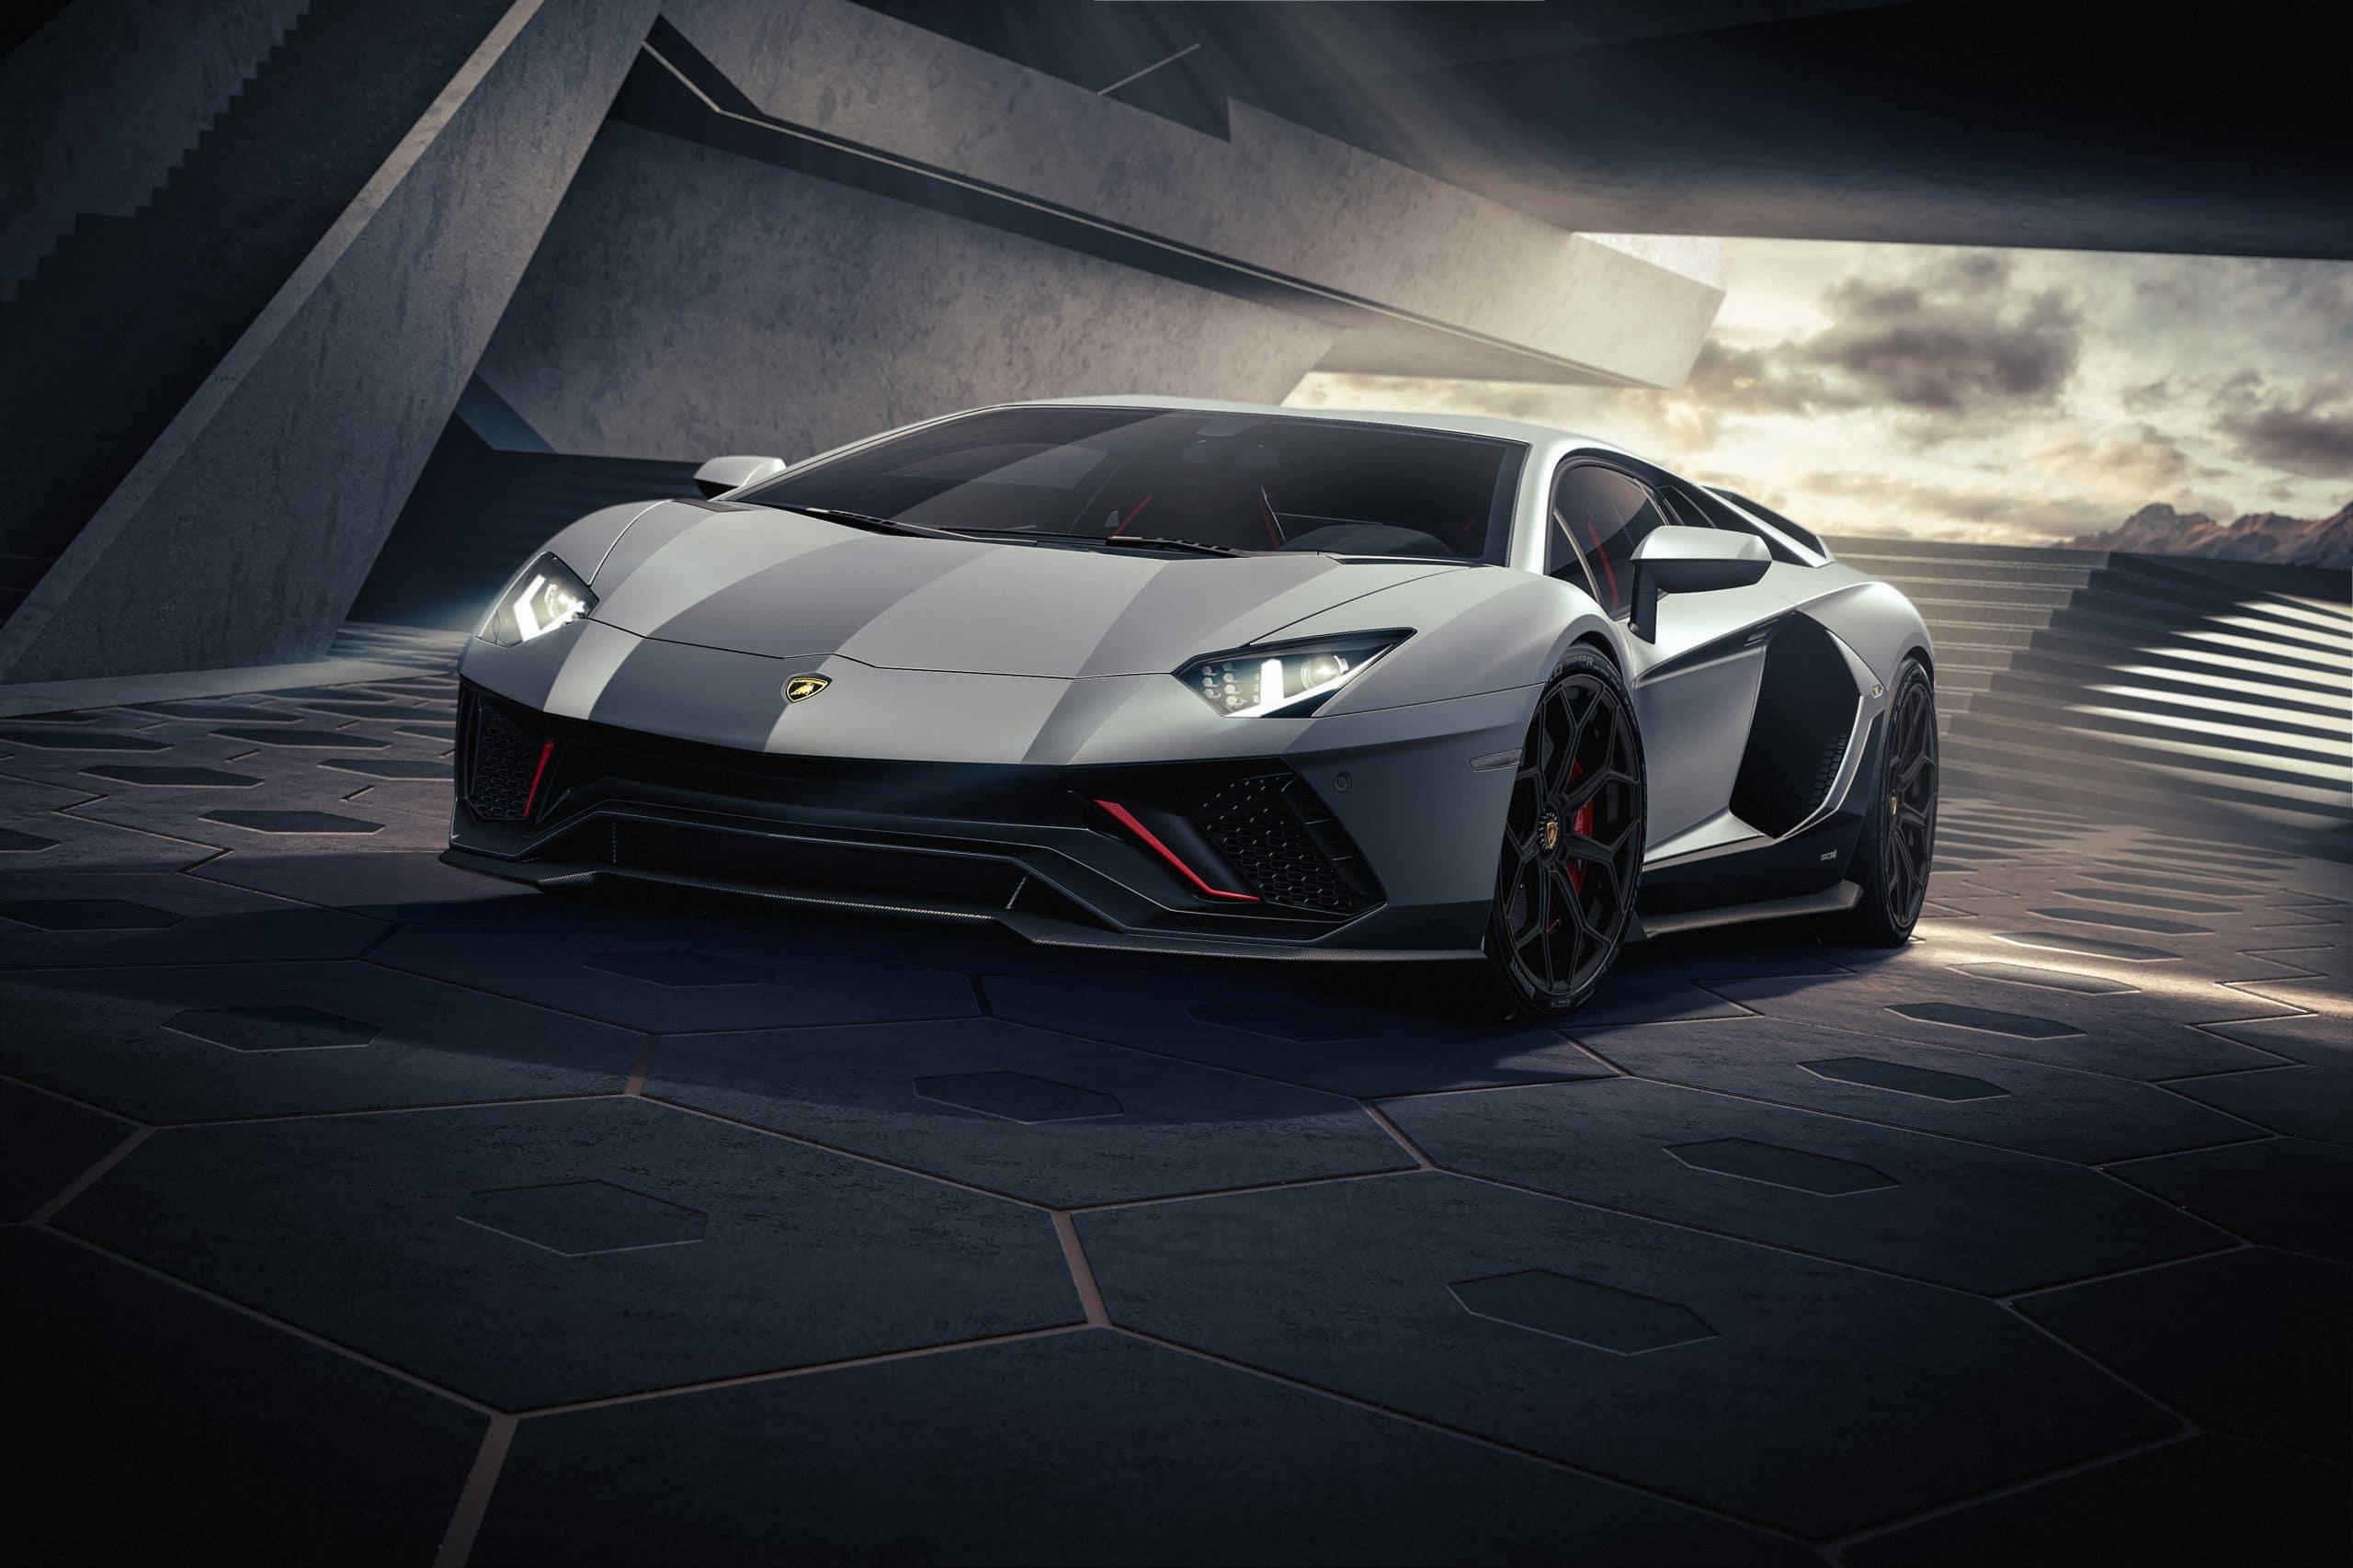 588383 scaled Lamborghini Aventador LP 780-4 Ultimae : Η τελευταία πράξη Lambo, Lamborghini, Lamborghini Aventador, Sunday, supercar, supercars, zblog, ειδήσεις, Νέα